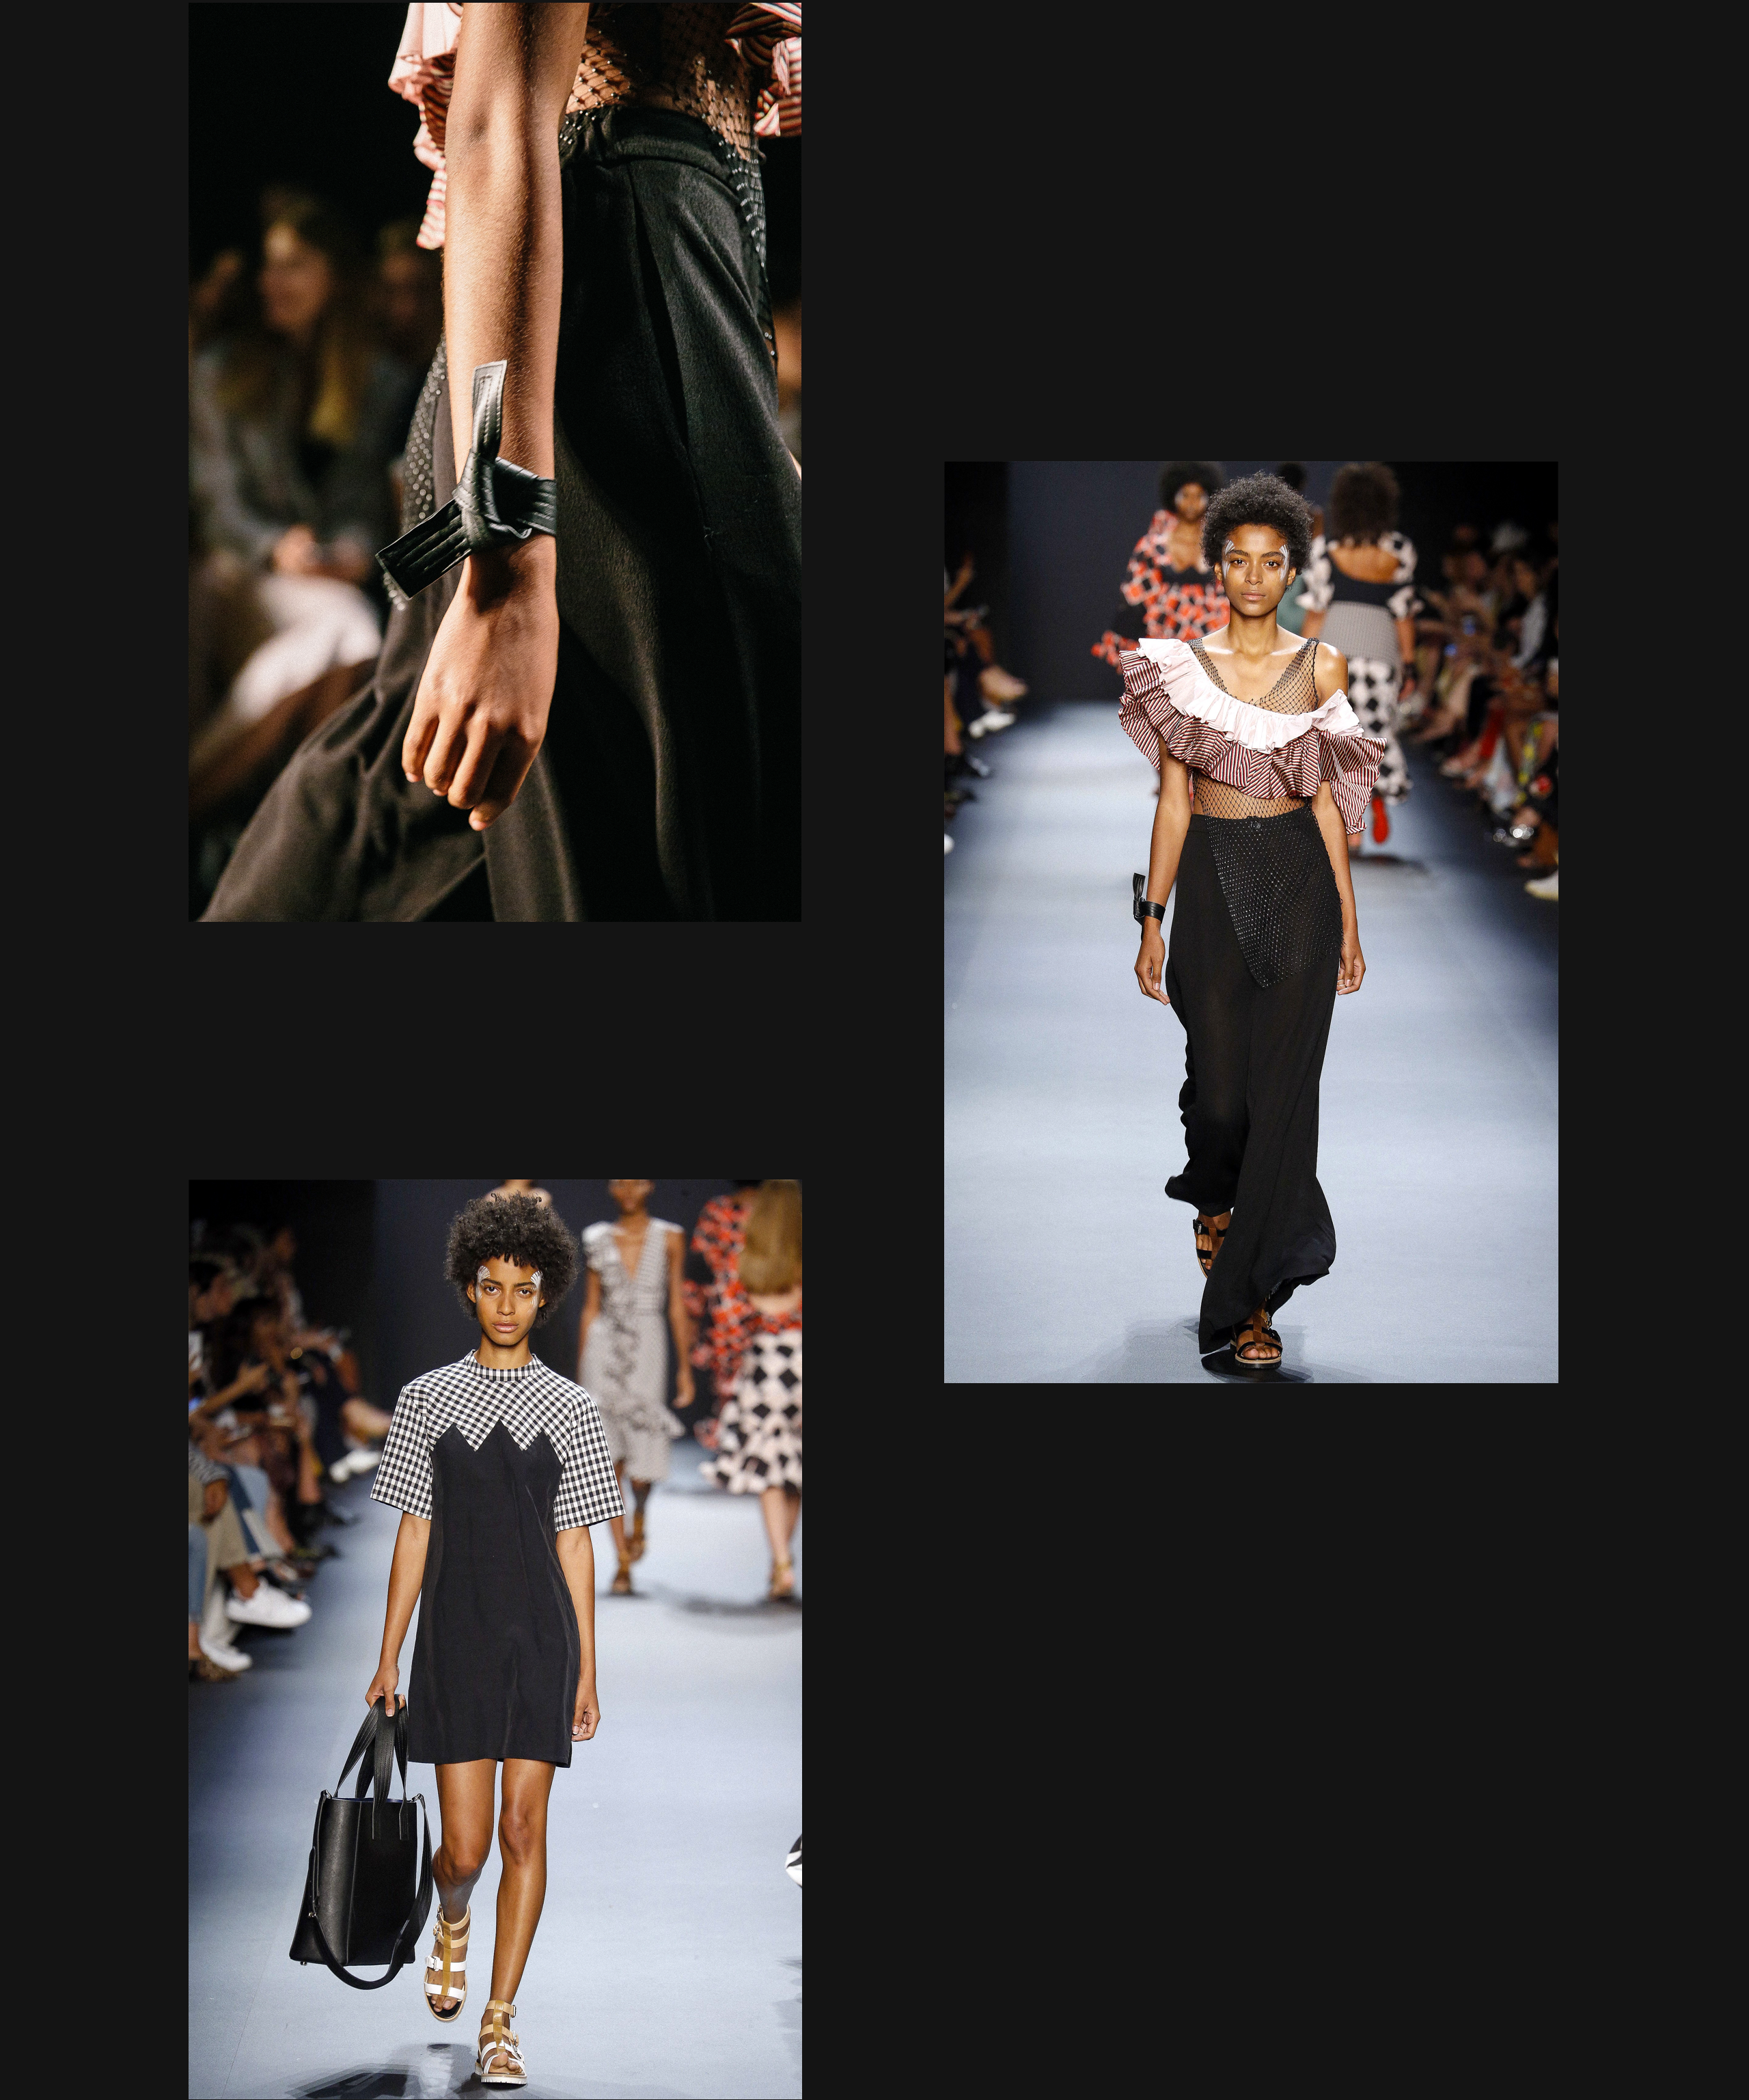 fashionphotos